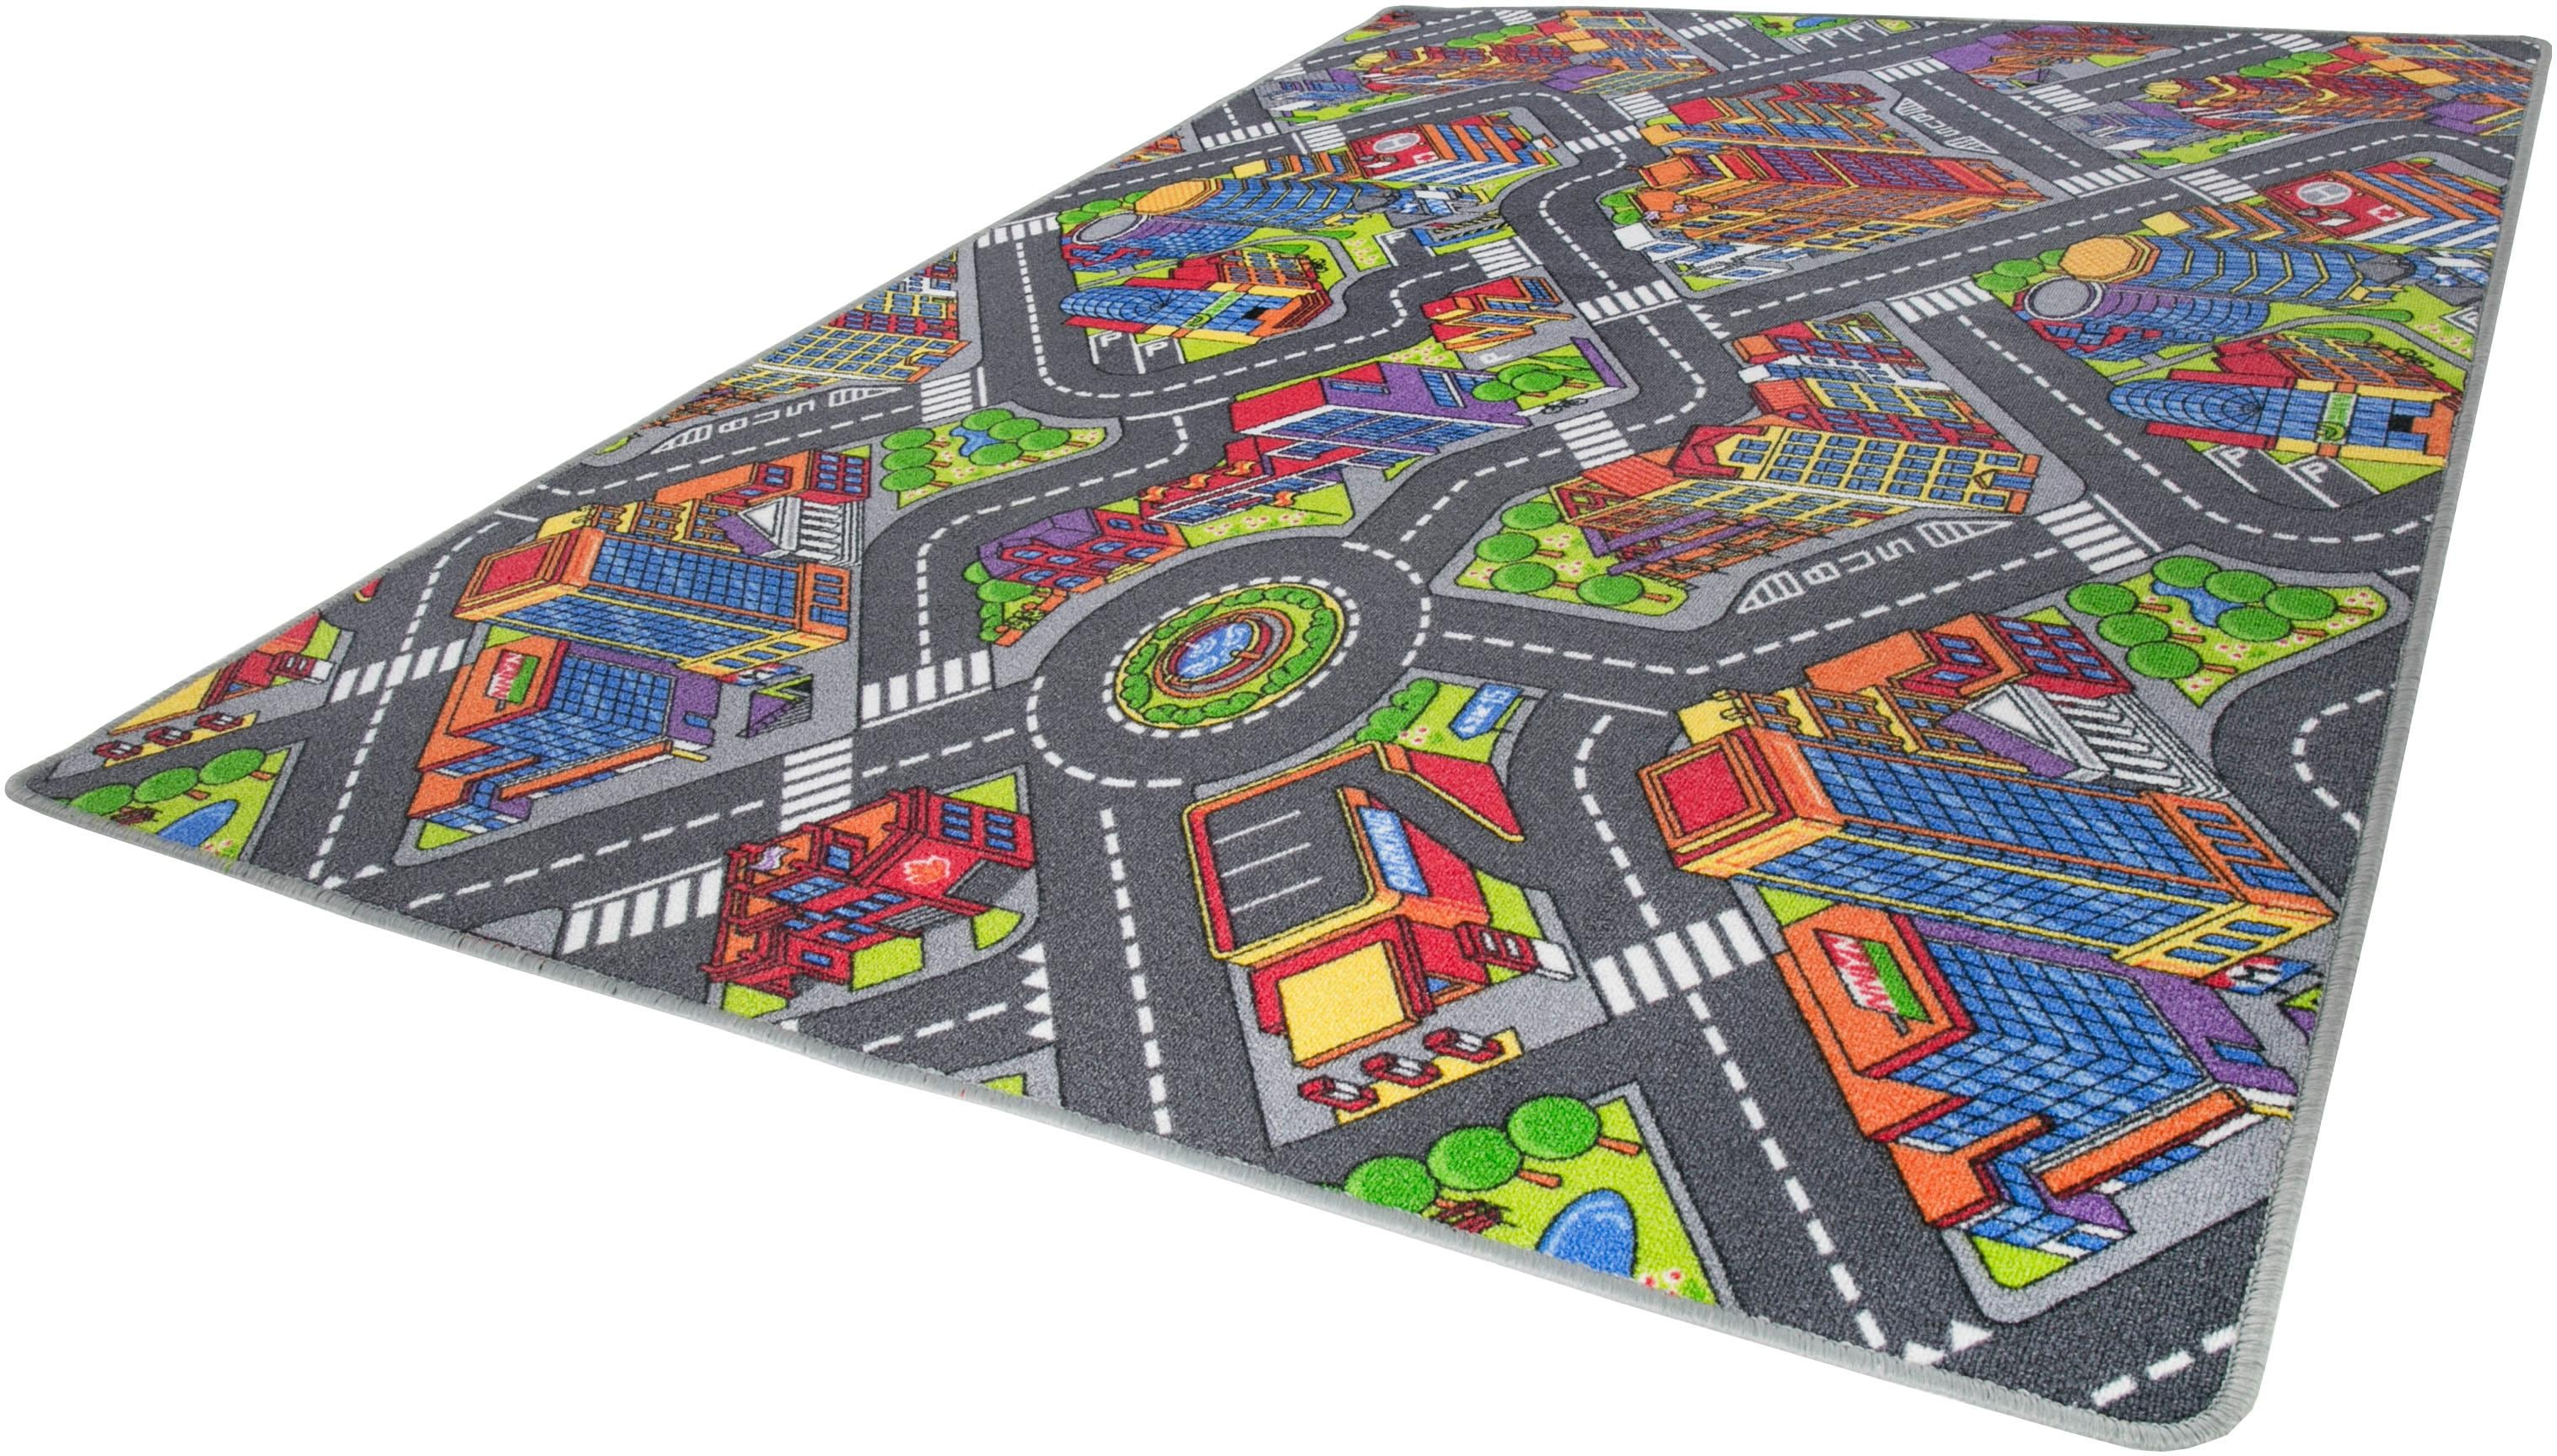 Kinderteppich Big City Andiamo rechteckig Höhe 7 mm maschinell getuftet